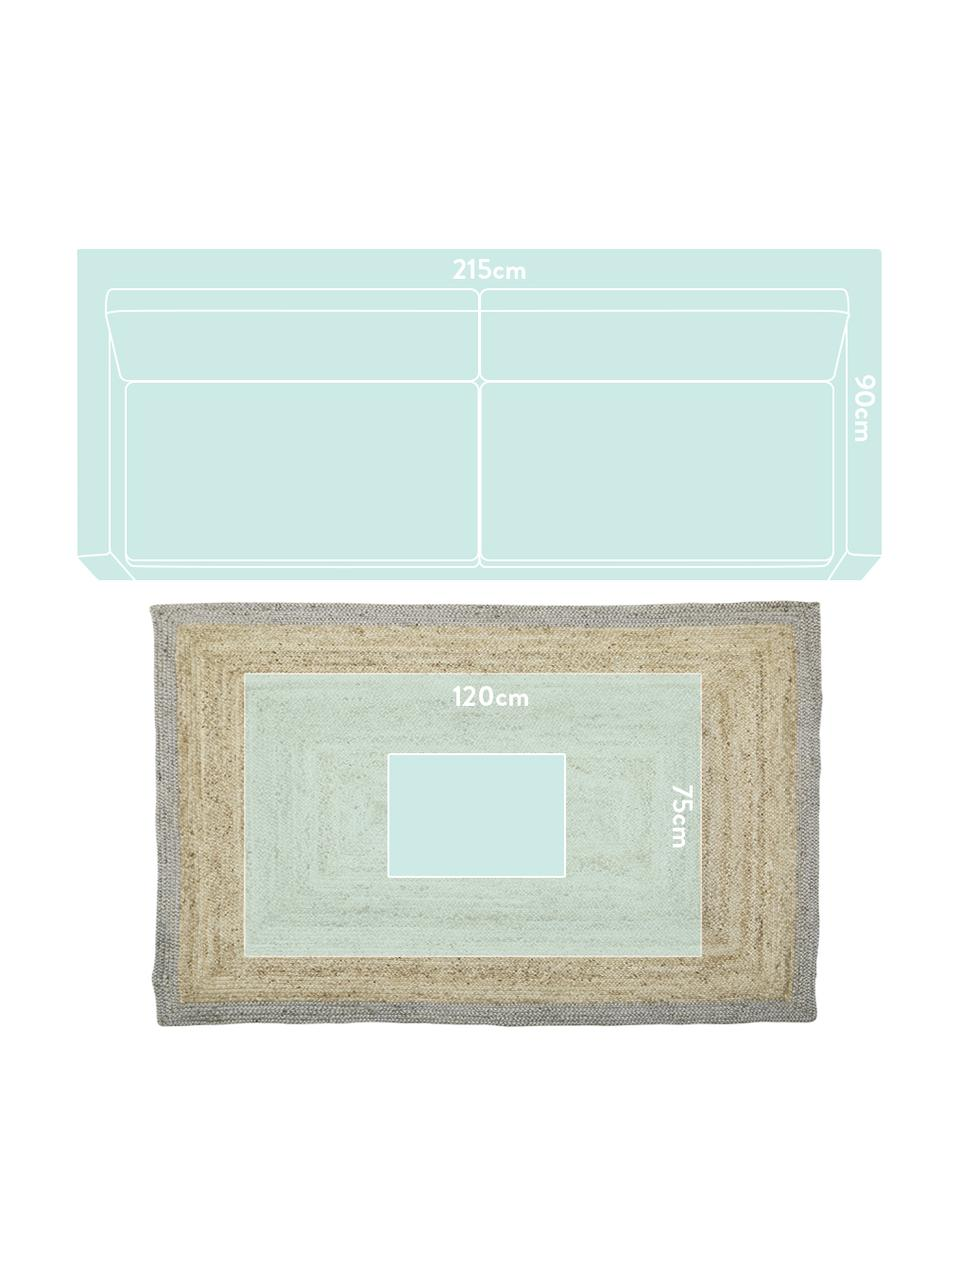 Tappeto in juta tessuto a mano Shanta, 100% juta, Beige, grigio, Larg. 160 x Lung. 230 cm